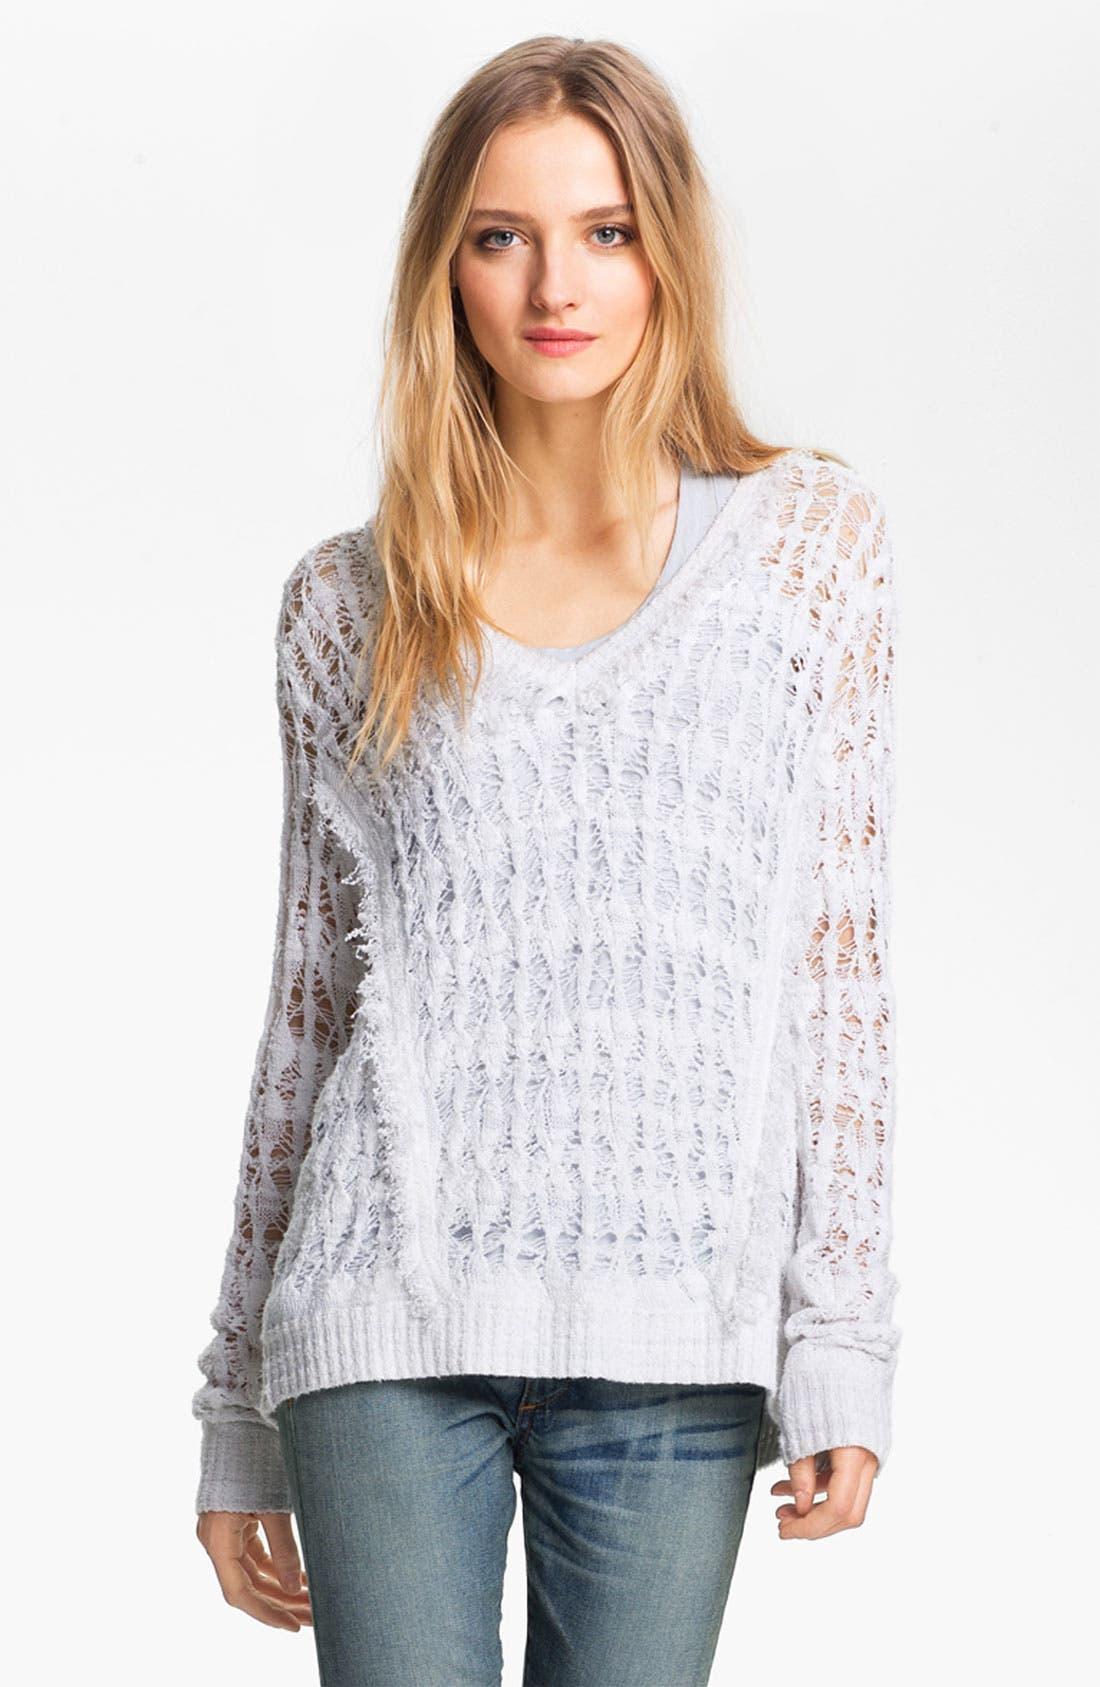 Main Image - rag & bone 'Vicky' Pullover